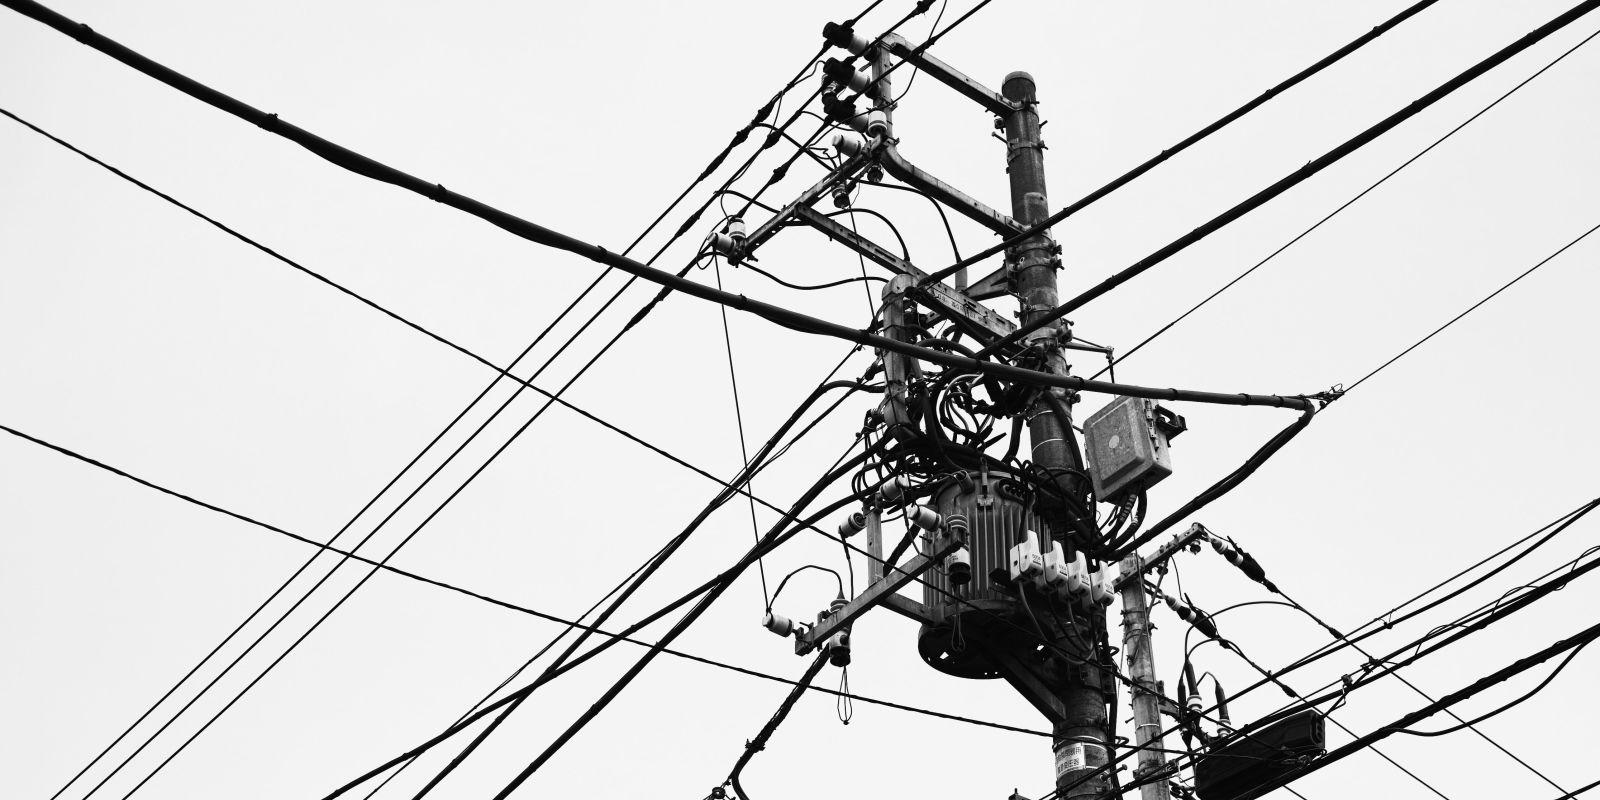 tokyo u0026 39 s  7 billion quest to get rid of utility poles asap